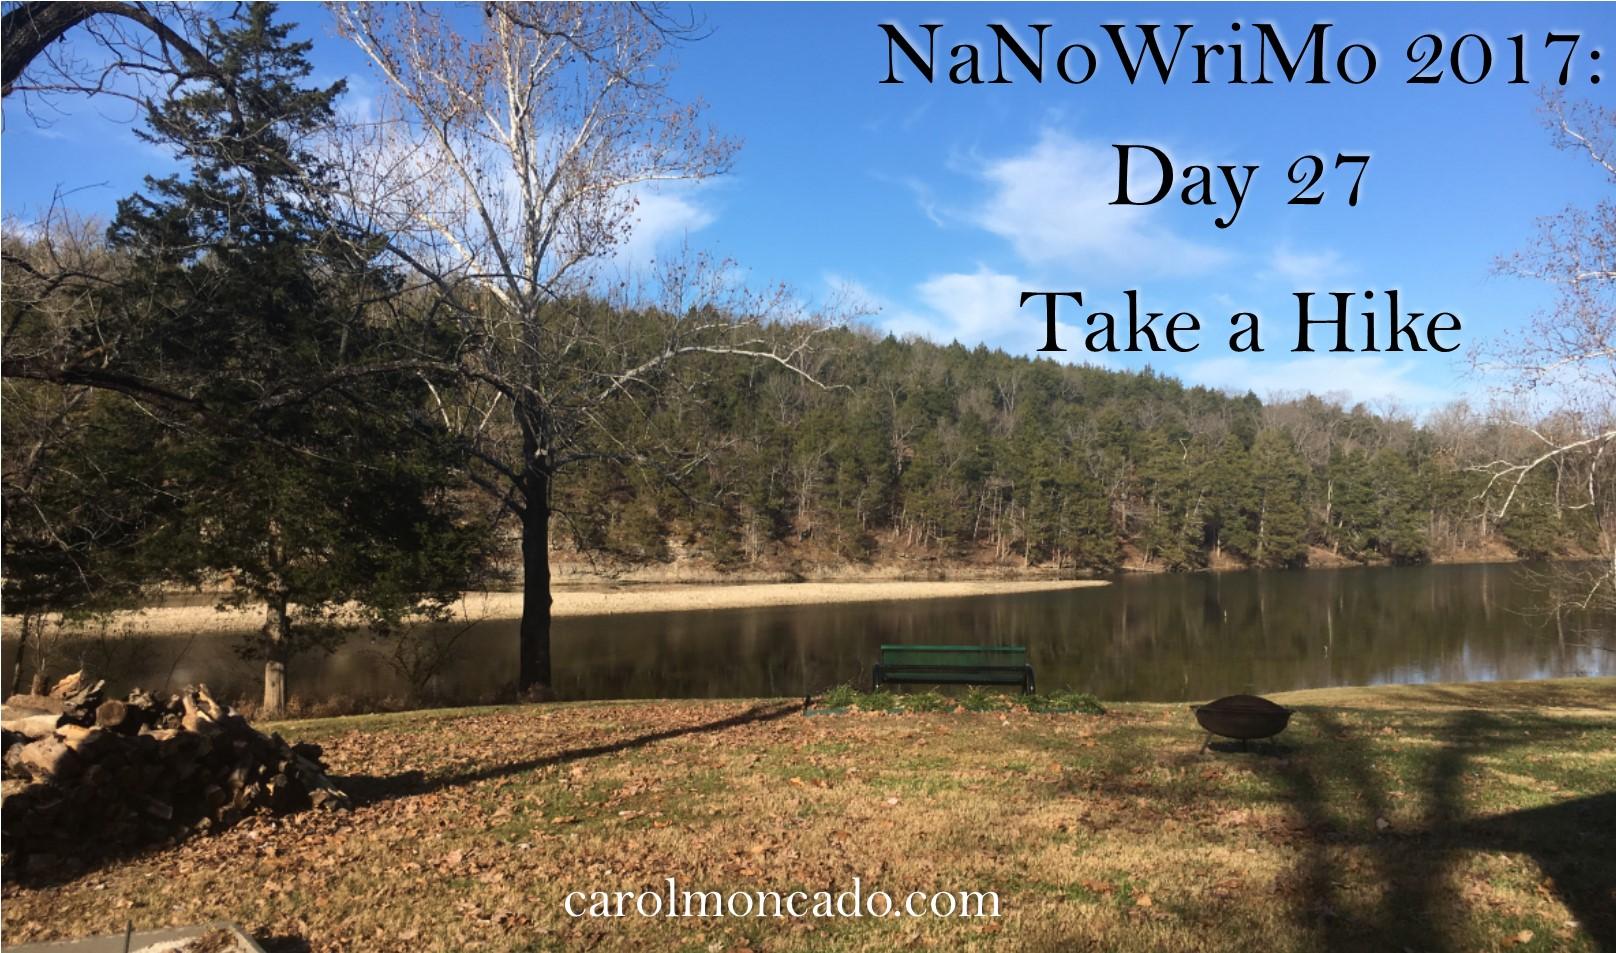 #NaNoWriMo2017, Day 27 or Take a Hike